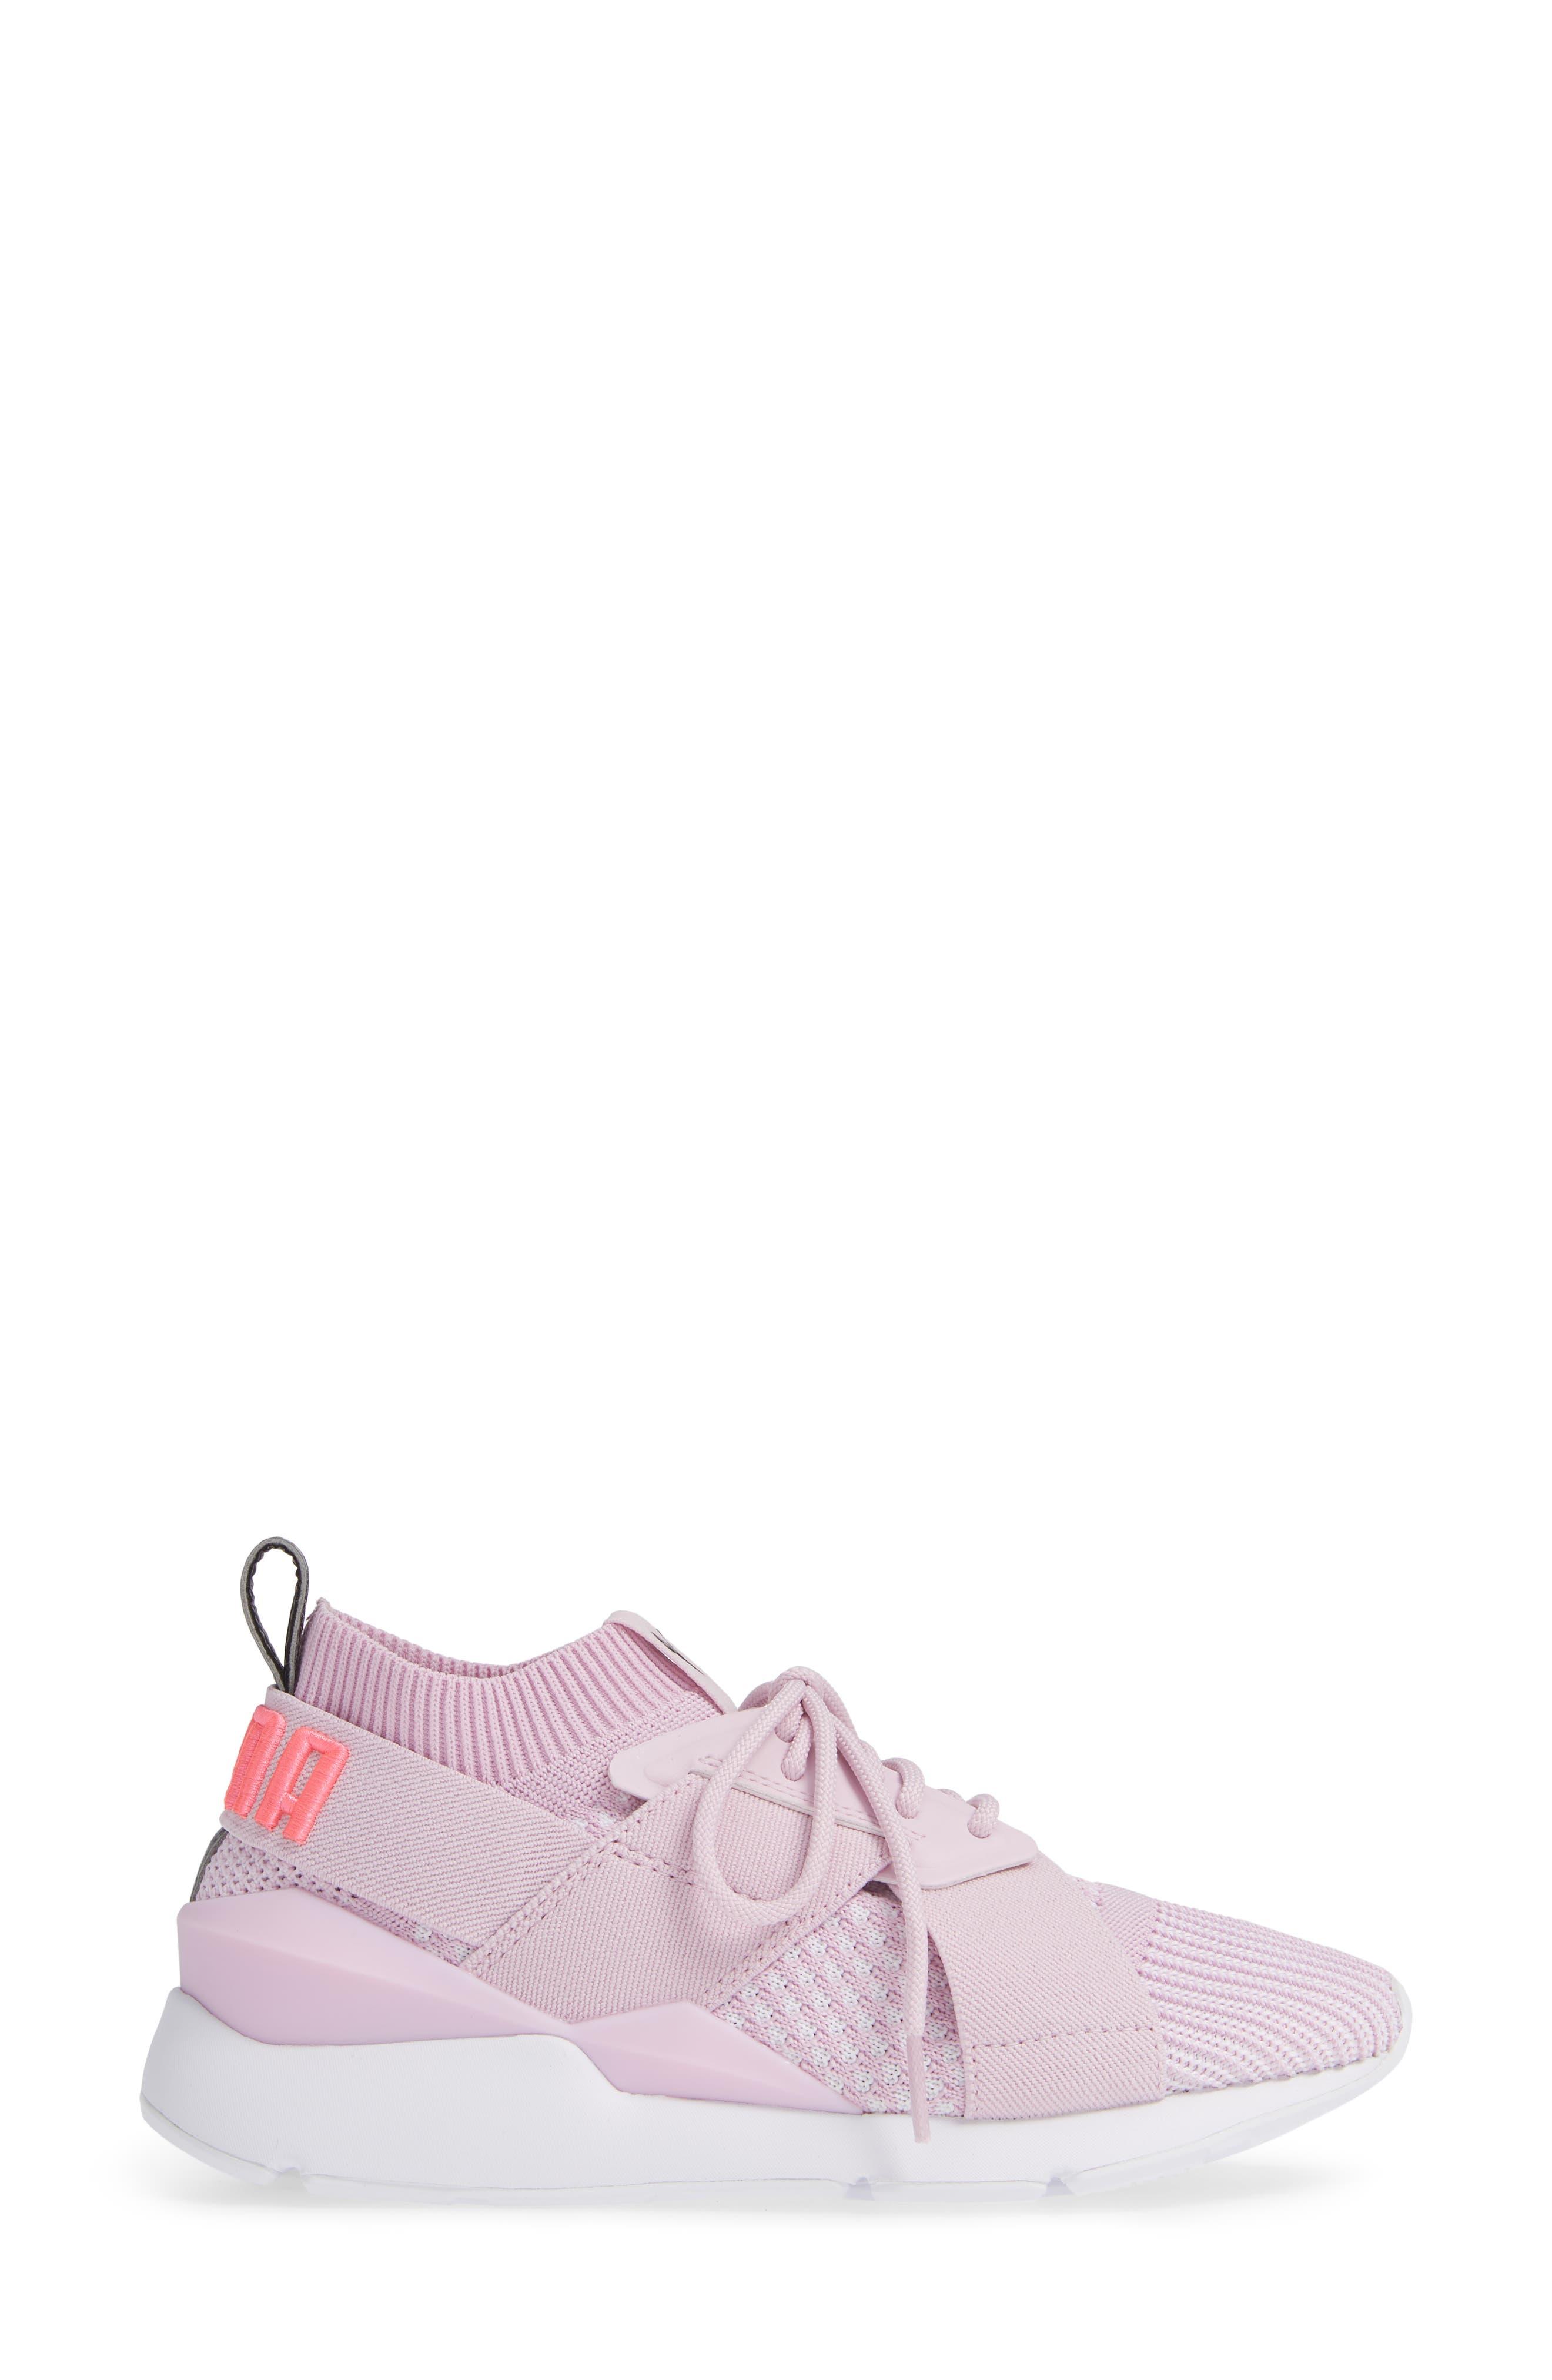 Muse EvoKNIT Sneaker,                             Alternate thumbnail 3, color,                             500